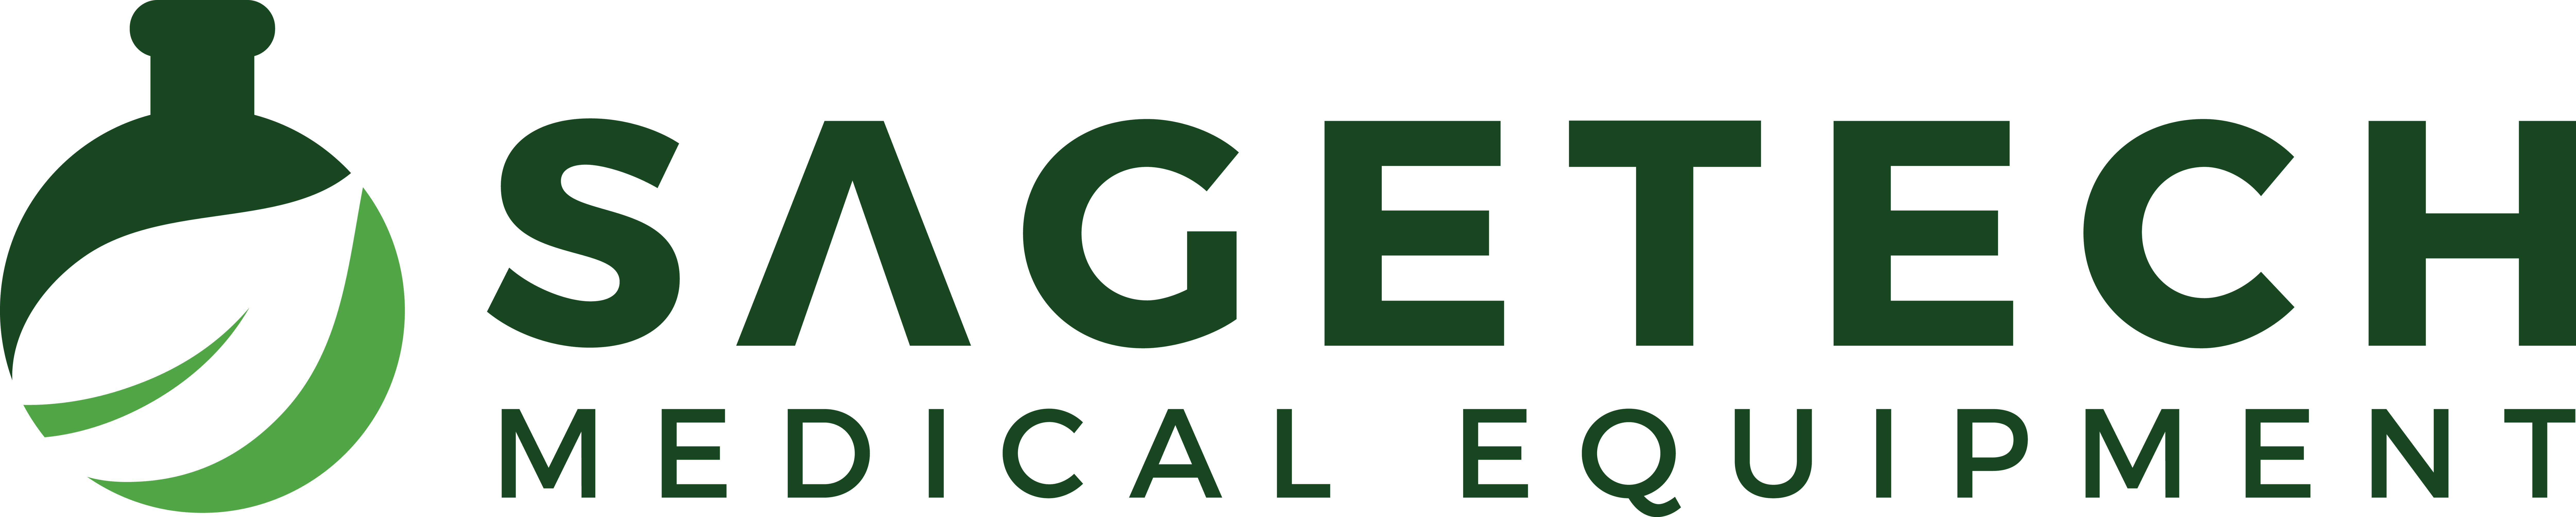 EMV Capital Limited